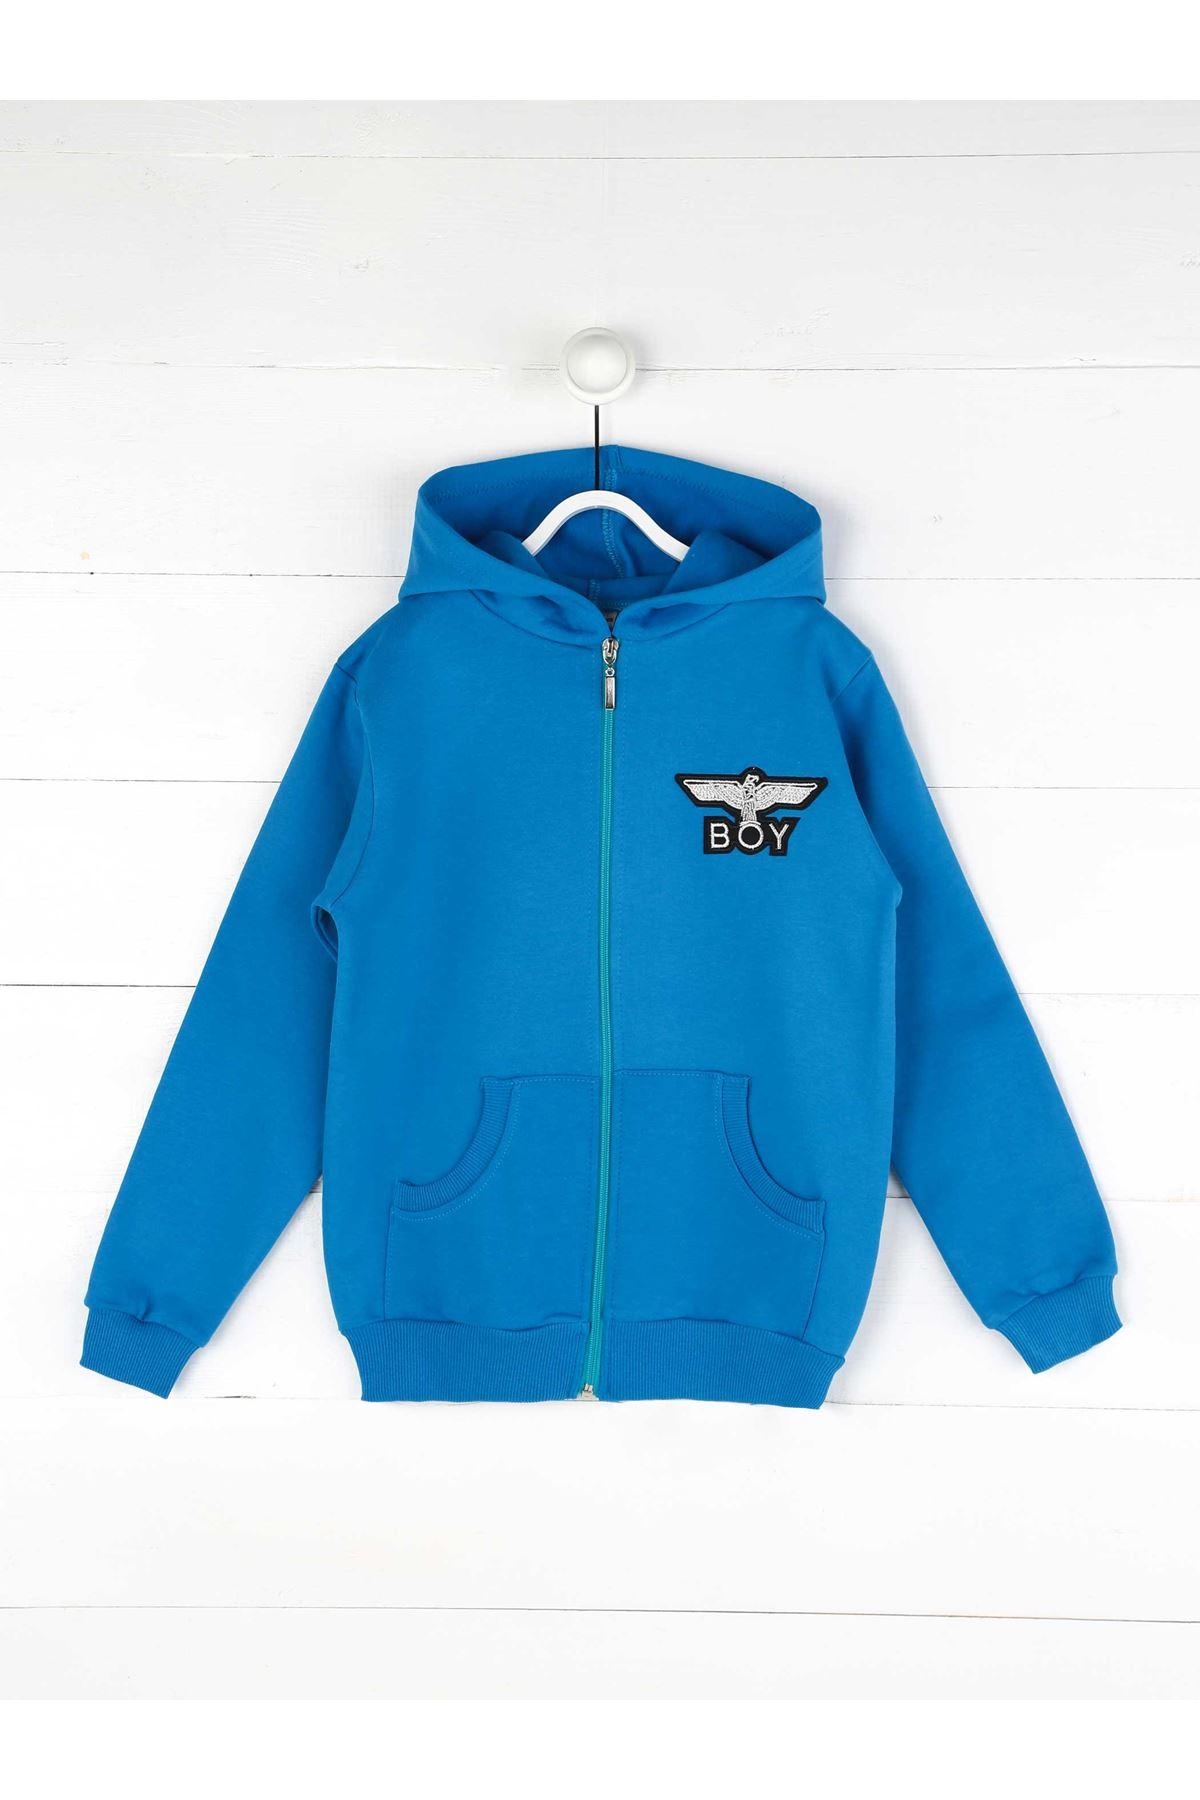 Blue Seasonal Male Child Sweatshirt